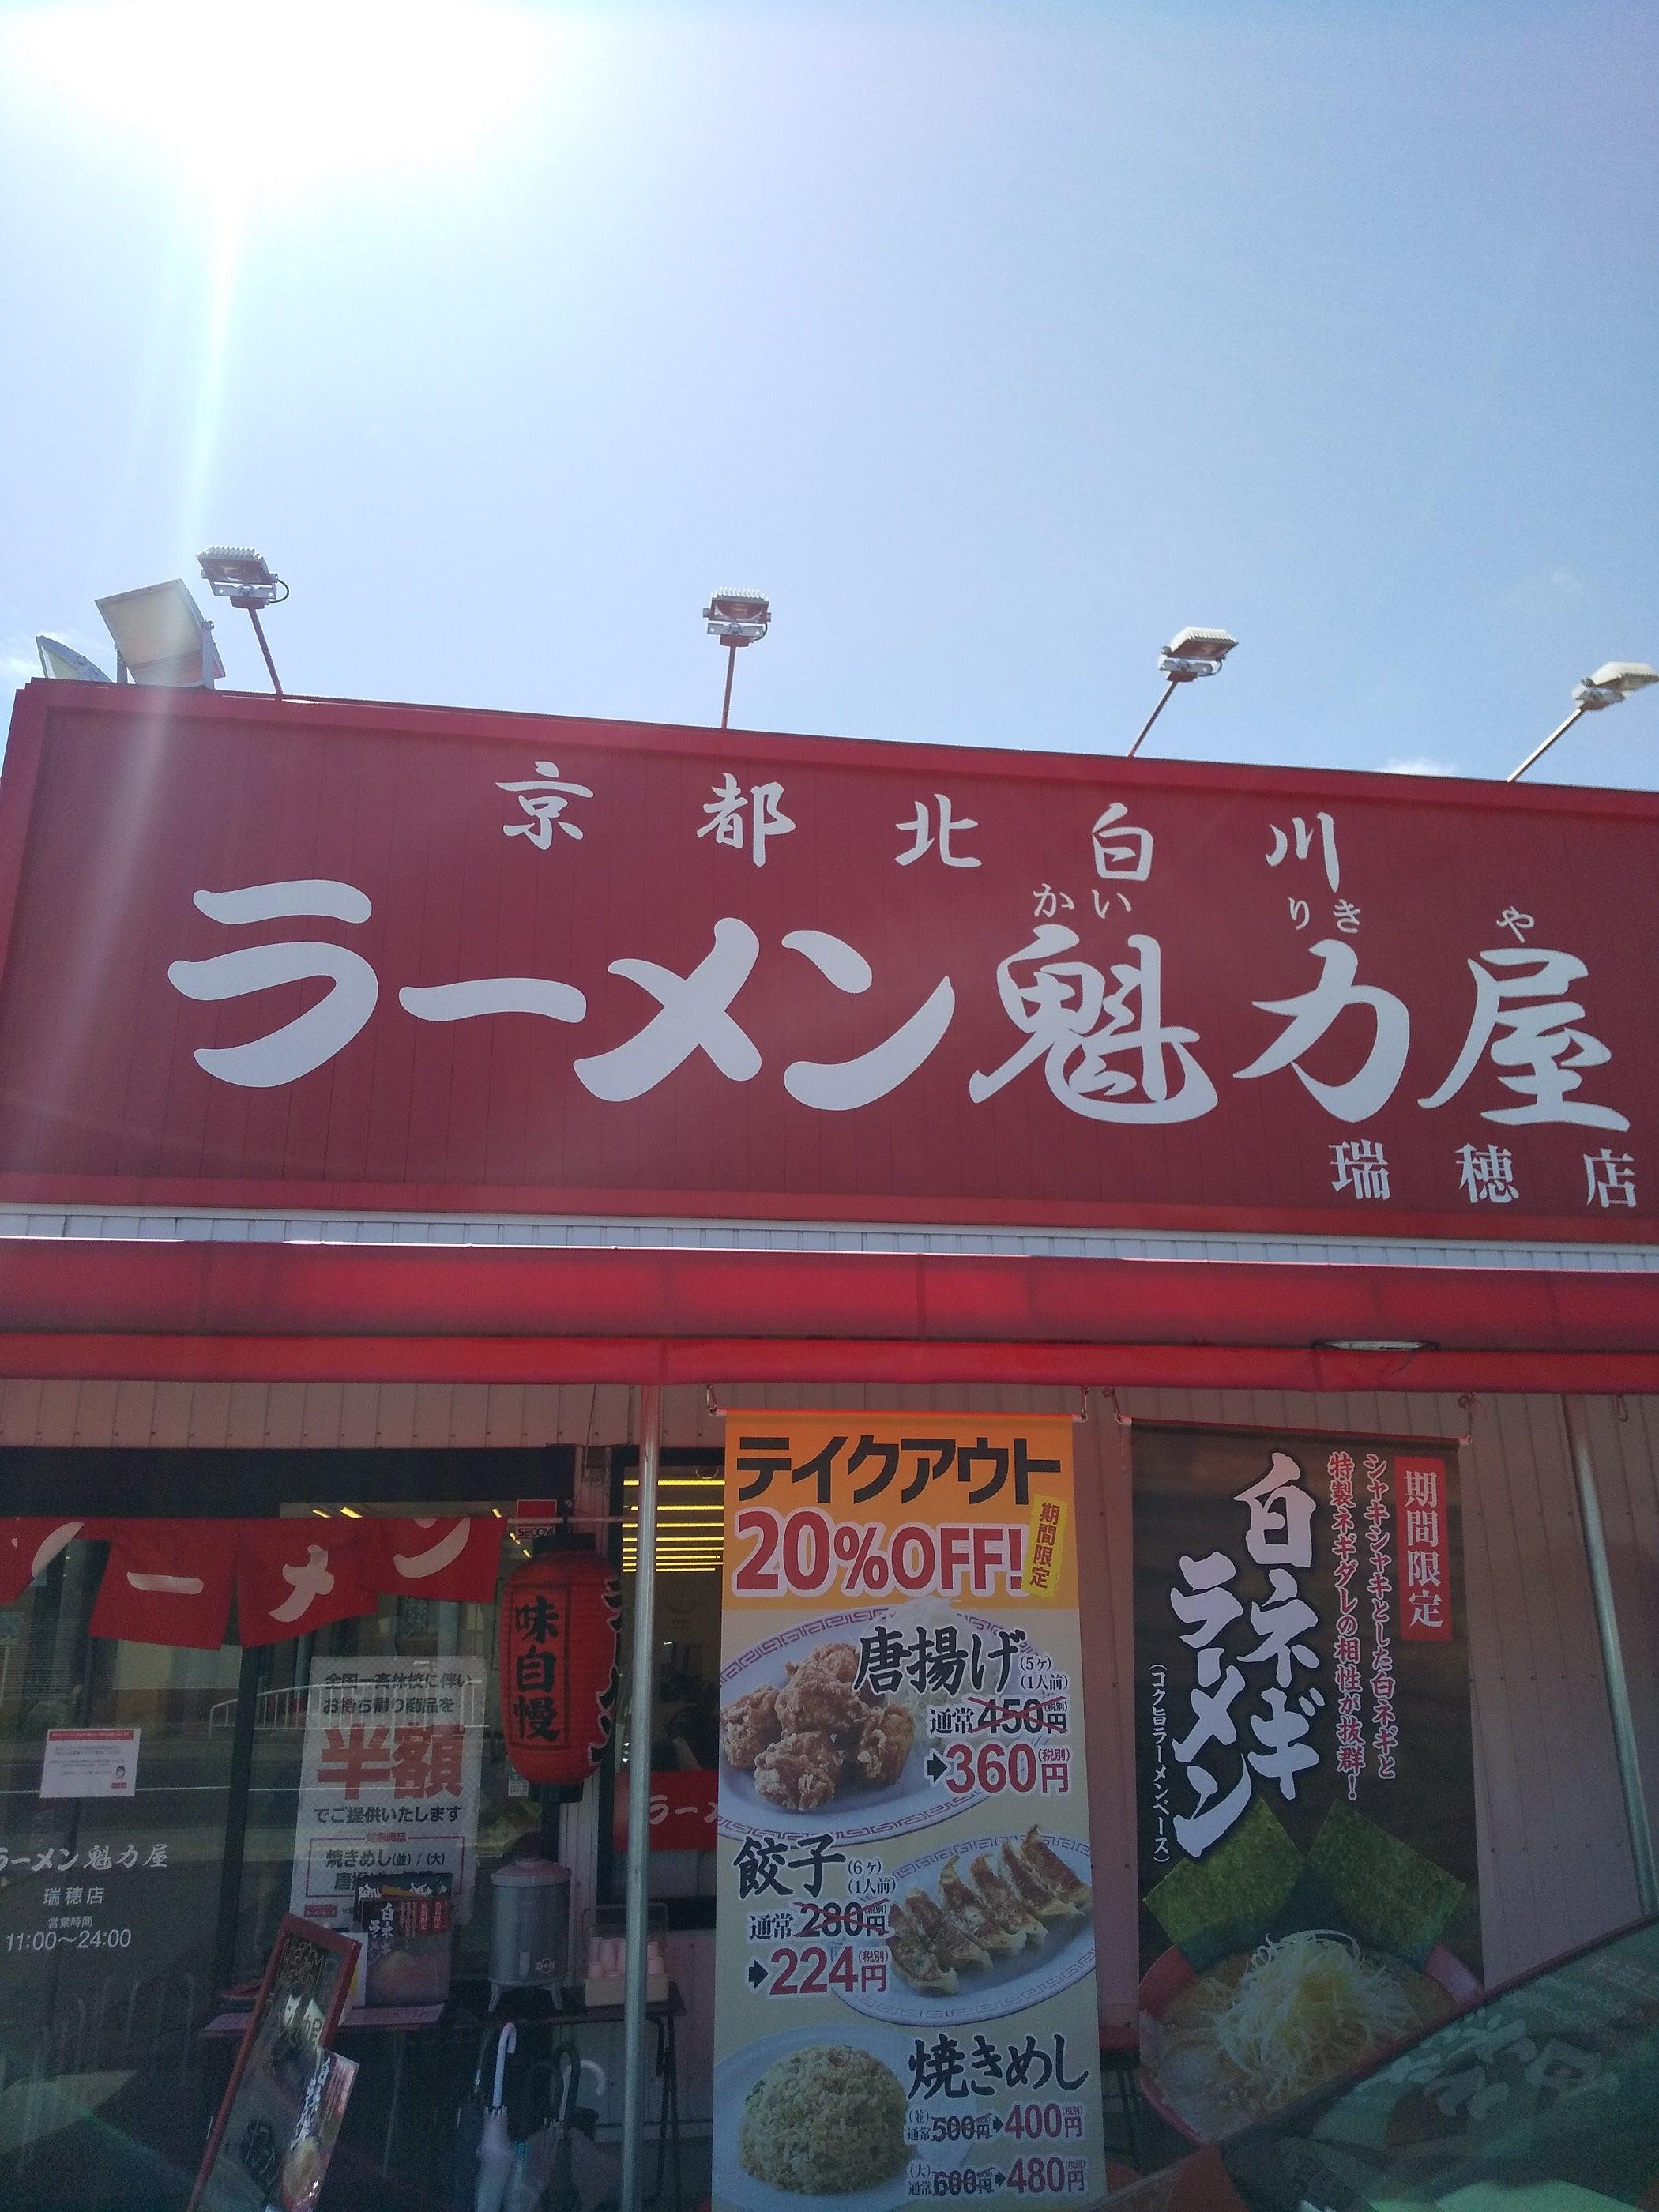 魁 力 京都 北白川 屋 ラーメン